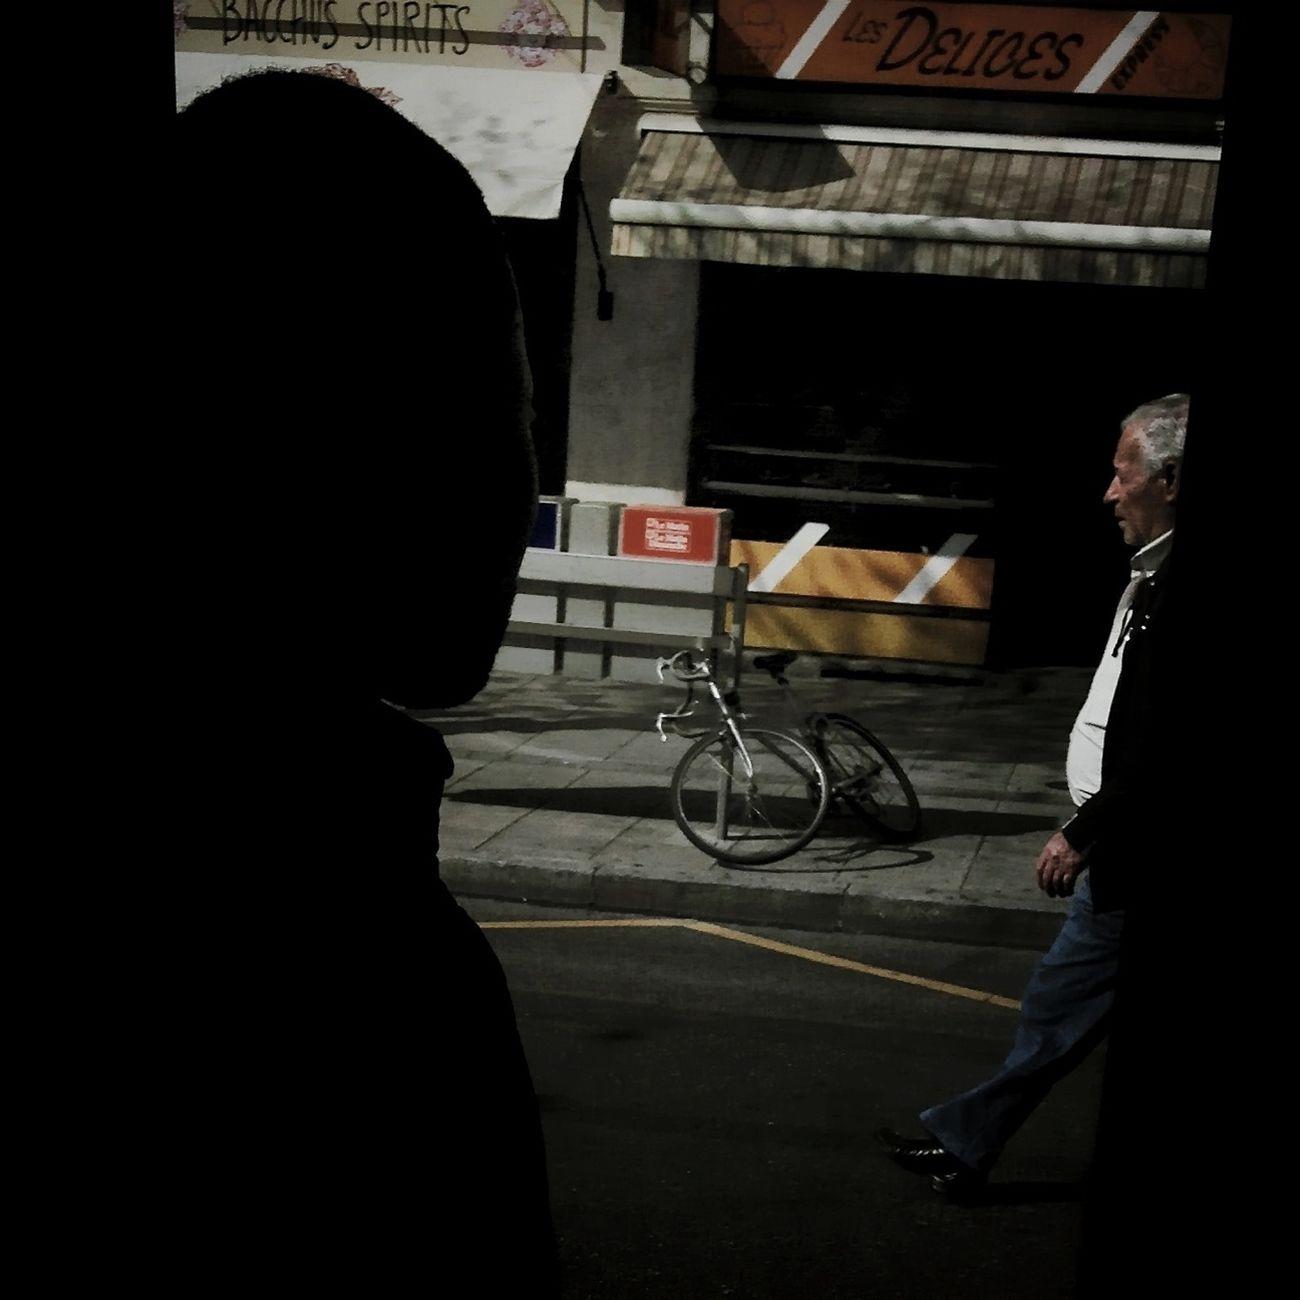 Streetphotography Performance Art Social Network Art NEM Street